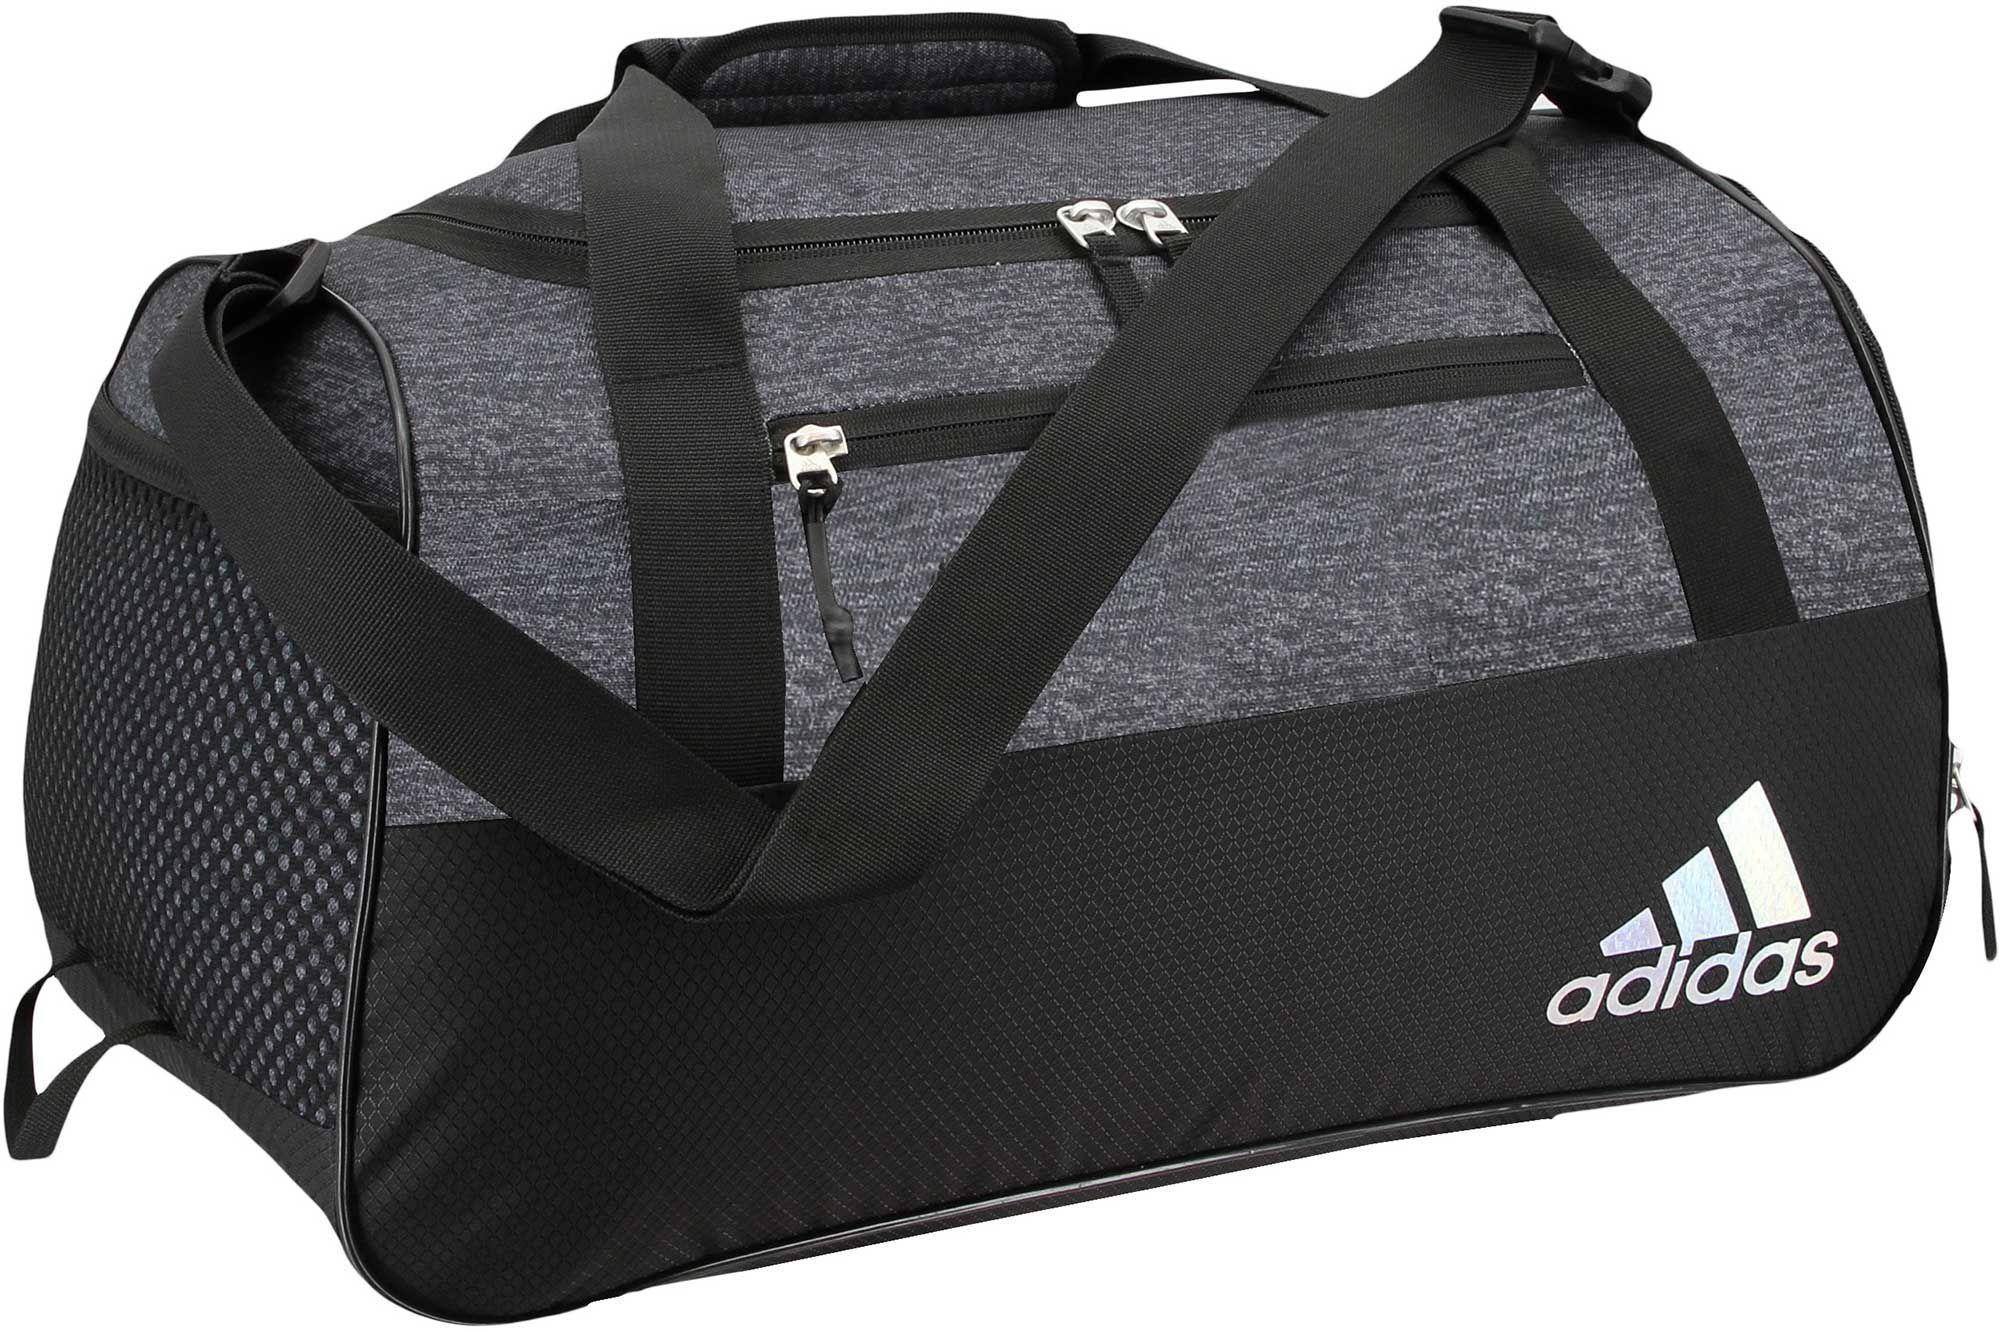 Adidas Women S Squad Iii Duffle Bag Adidas Duffle Bag Duffel Bag